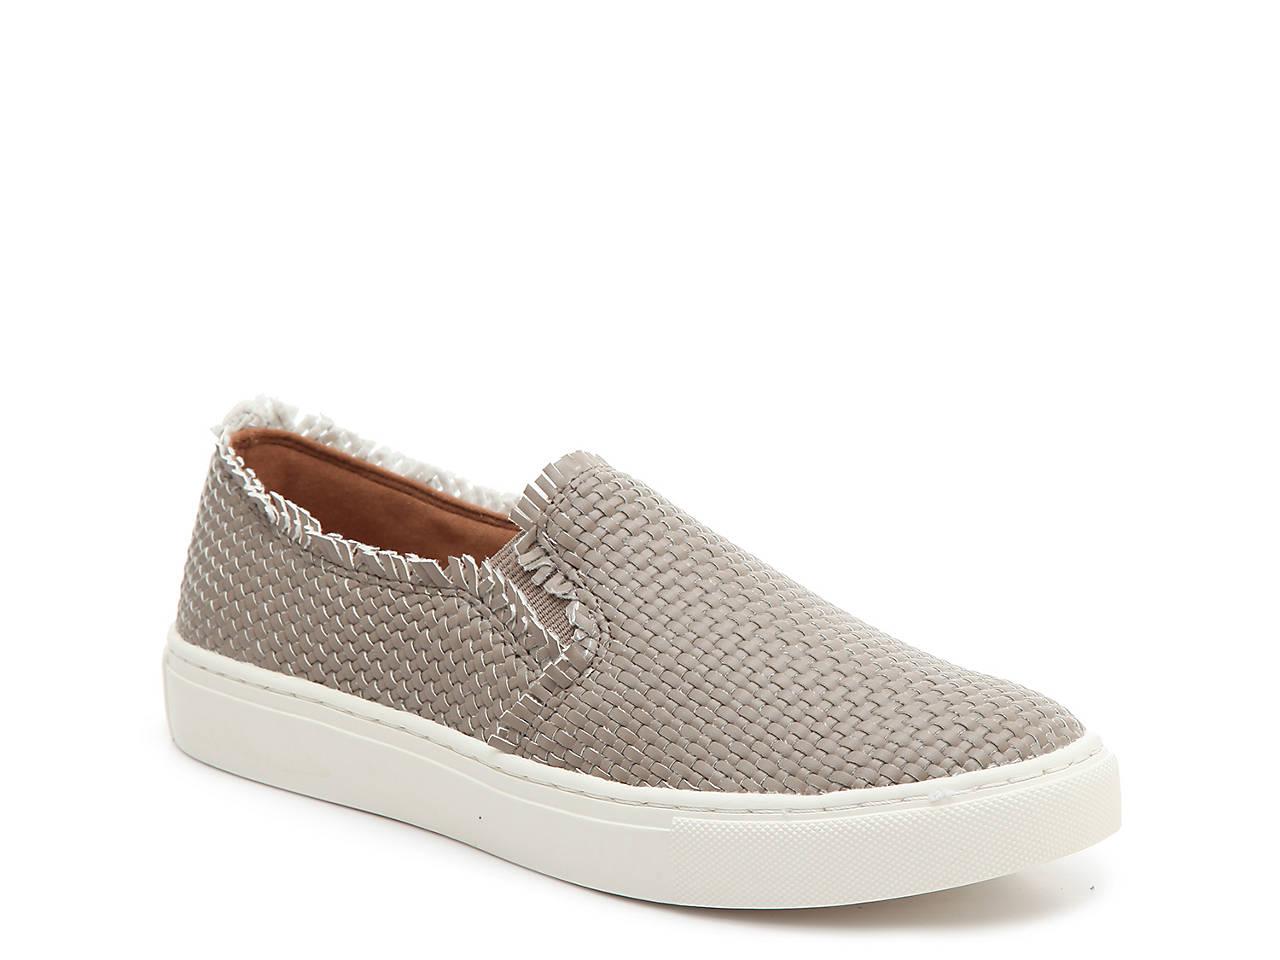 b267cbc1cbd Indigo Rd. Kicky Slip-On Sneaker Women s Shoes